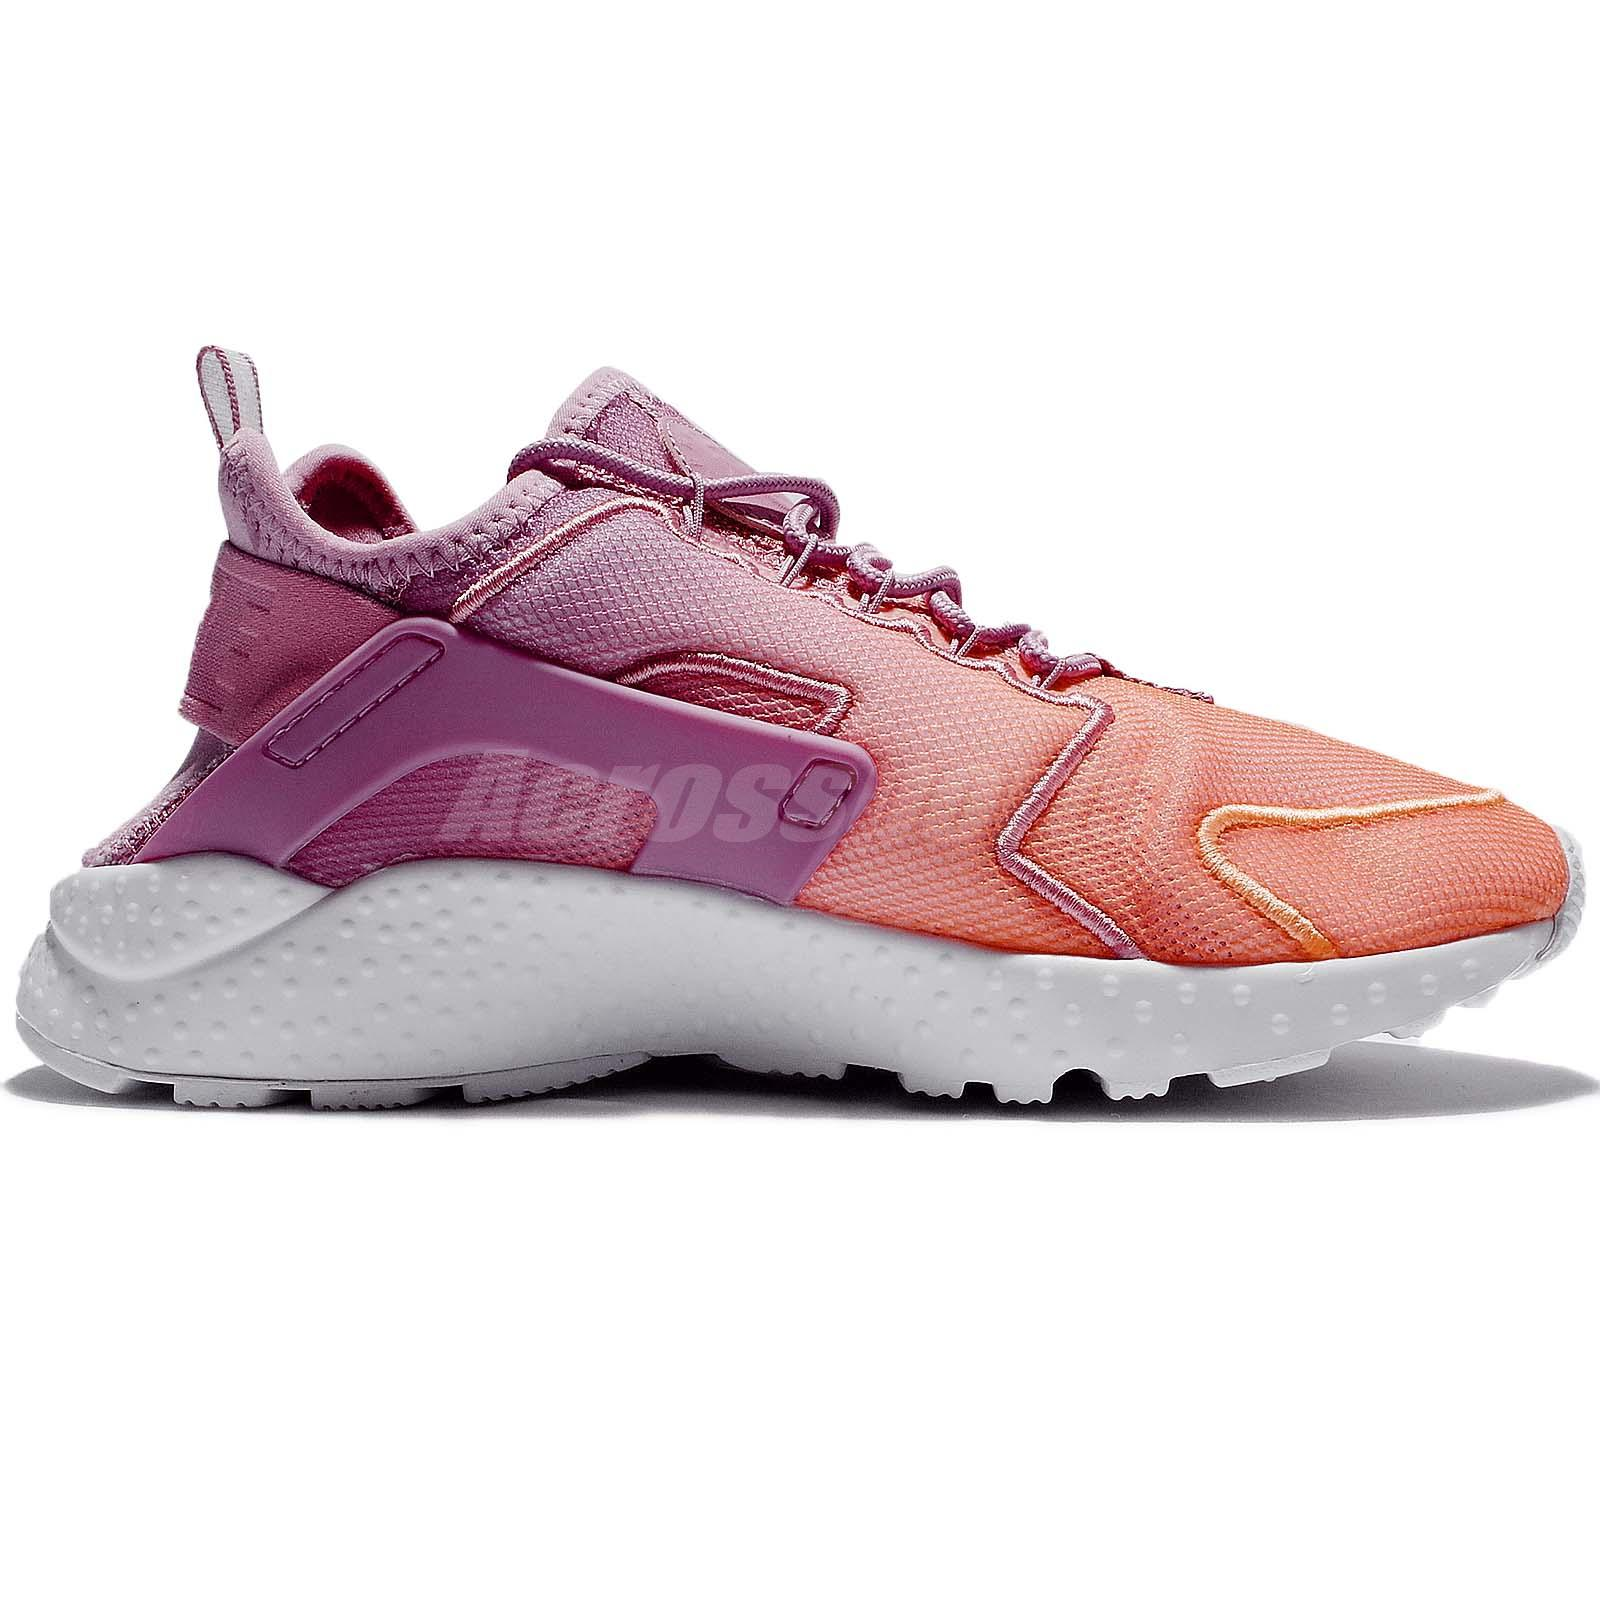 4a644c139ea8 Nike Wmns Air Huarache Run Ultra BR Breathe Orchid Women Running ...